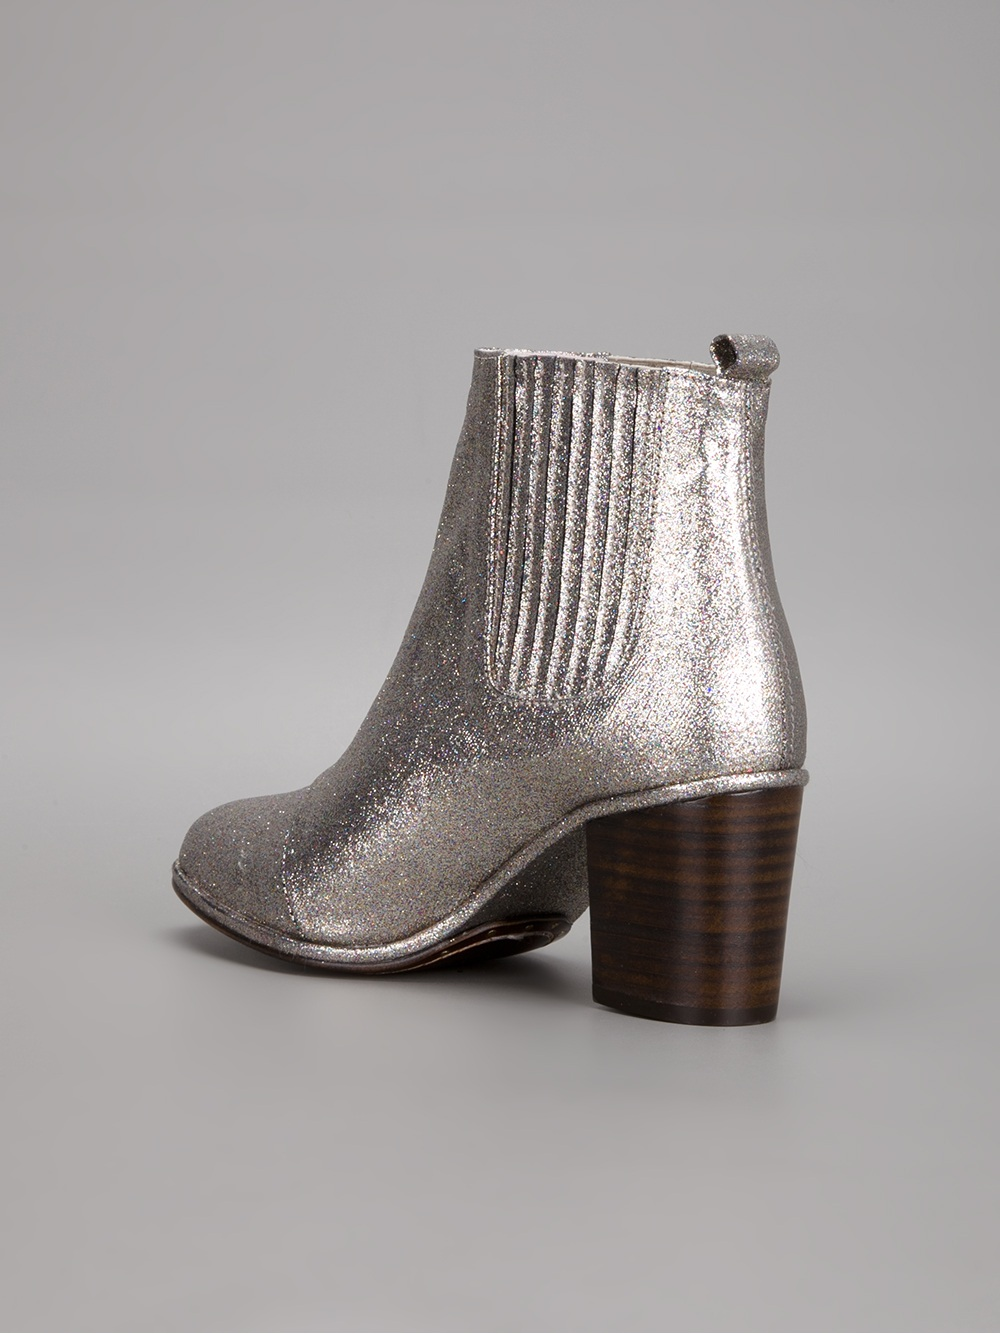 Opening Ceremony Fall 2015: Opening Ceremony 'brenda' Boot In Metallic